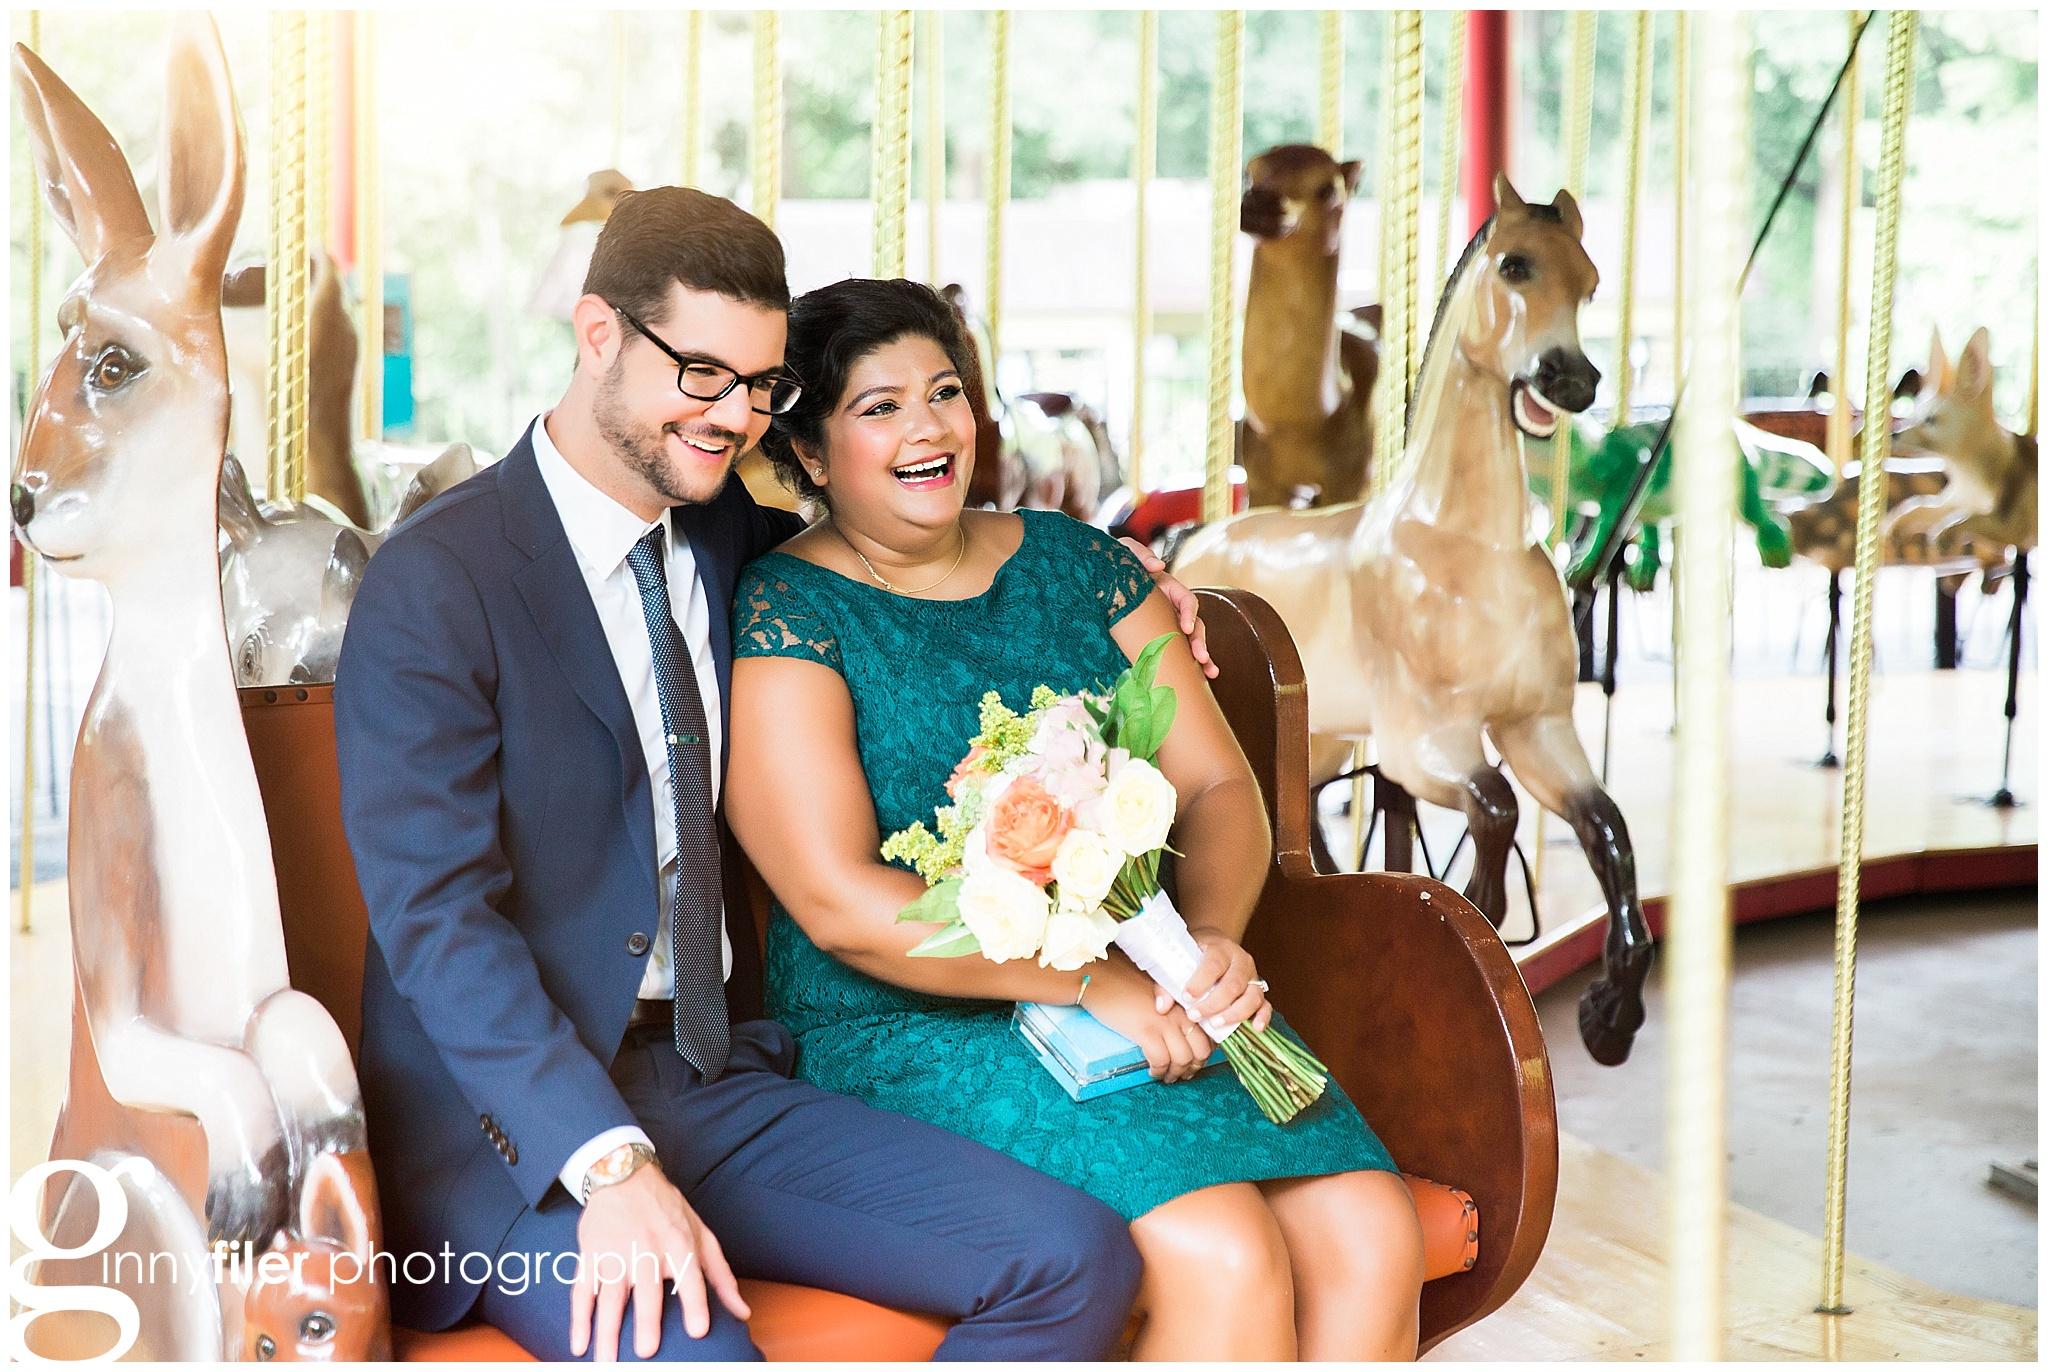 zoo_wedding_RinaandDerek_0014.jpg